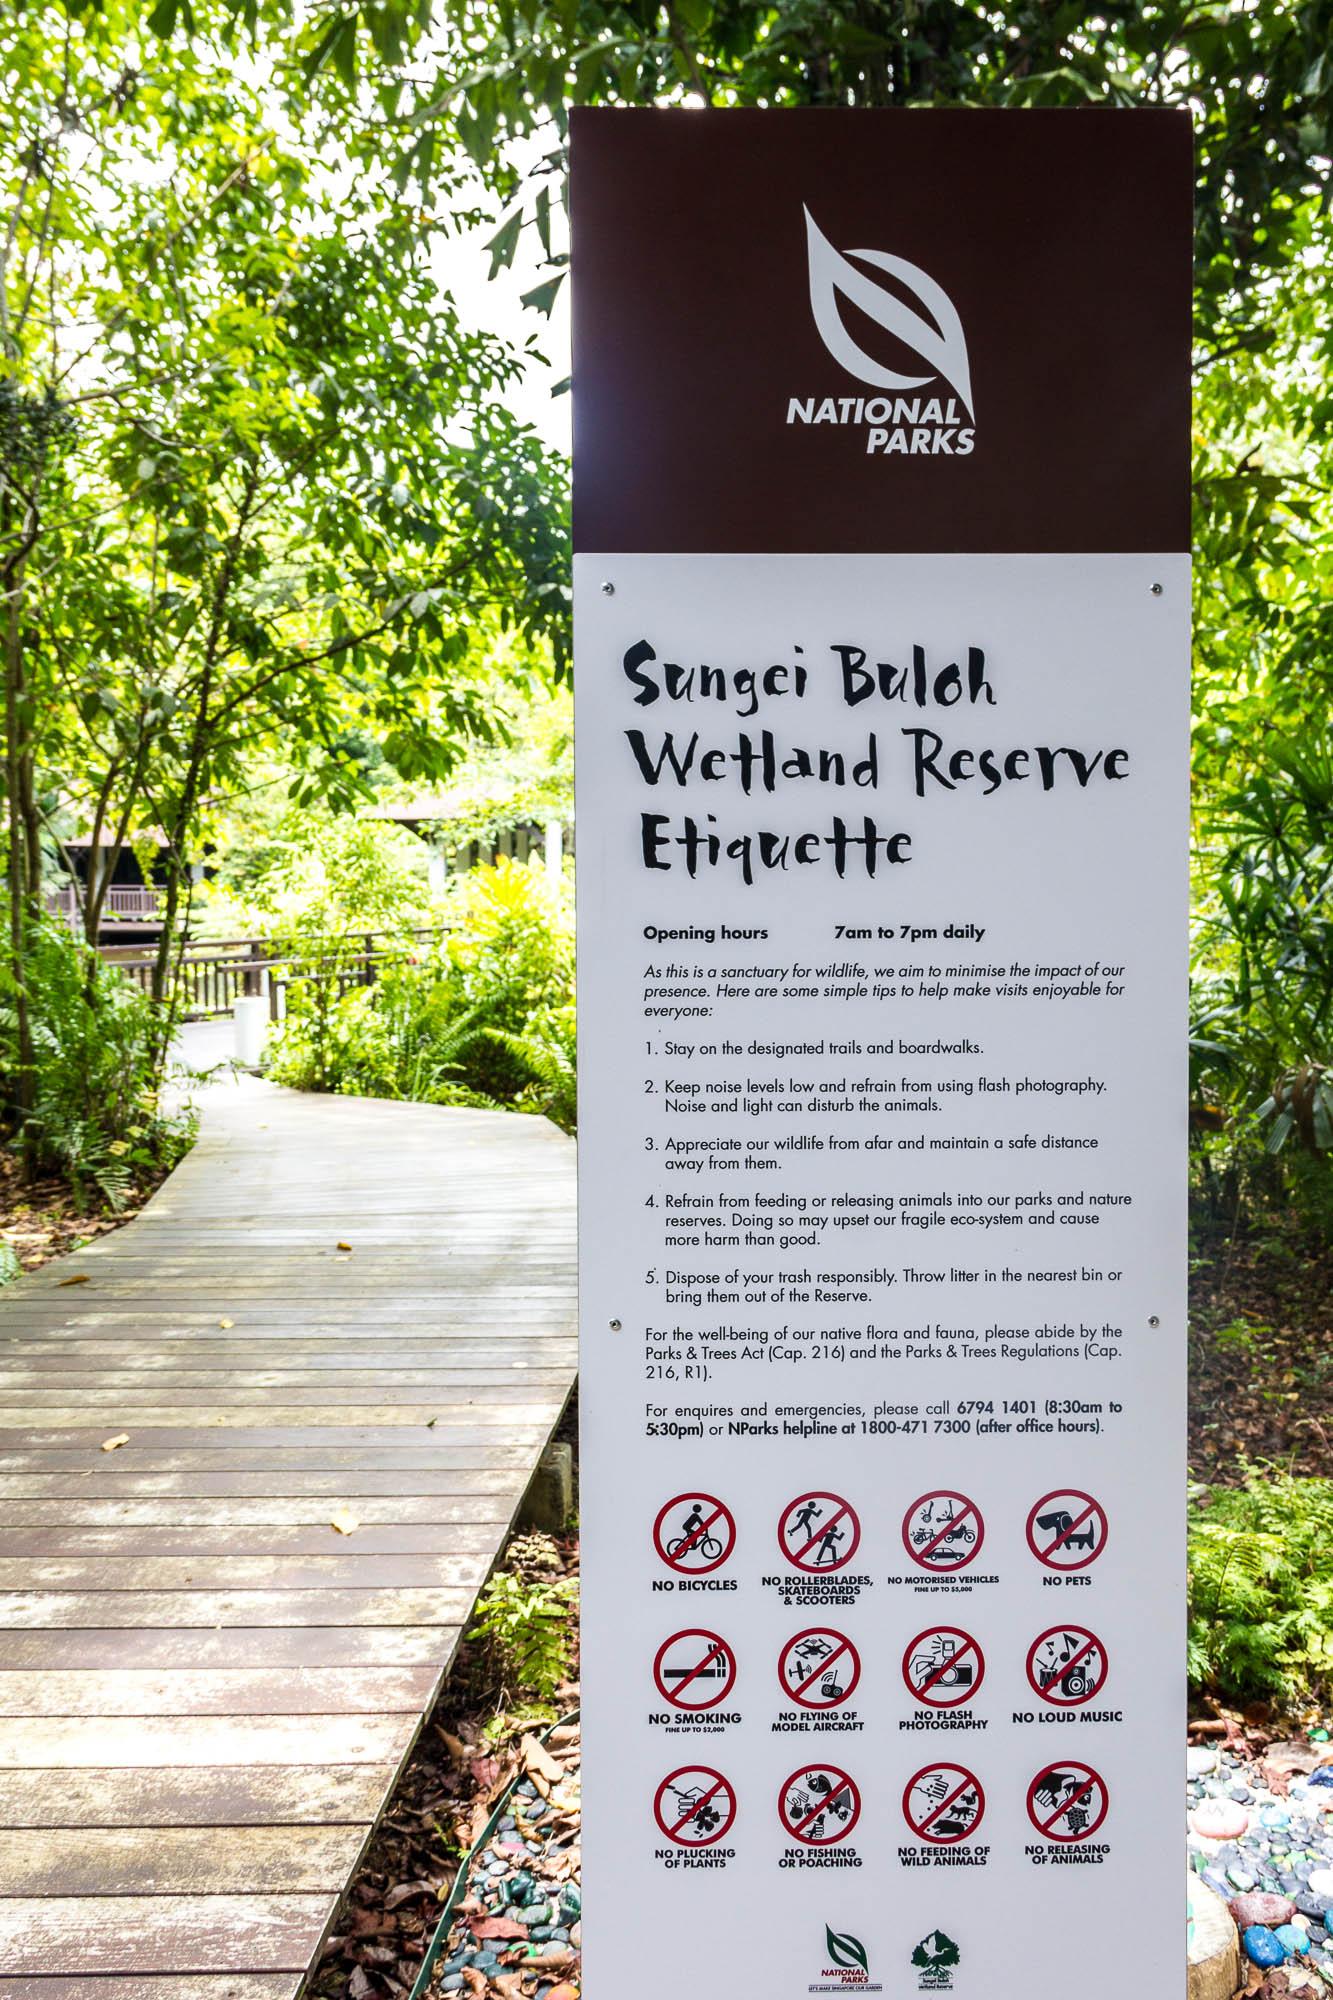 Sungei Buloh Wetland Reserve Etiquette, Kranji Countryside, Singapore